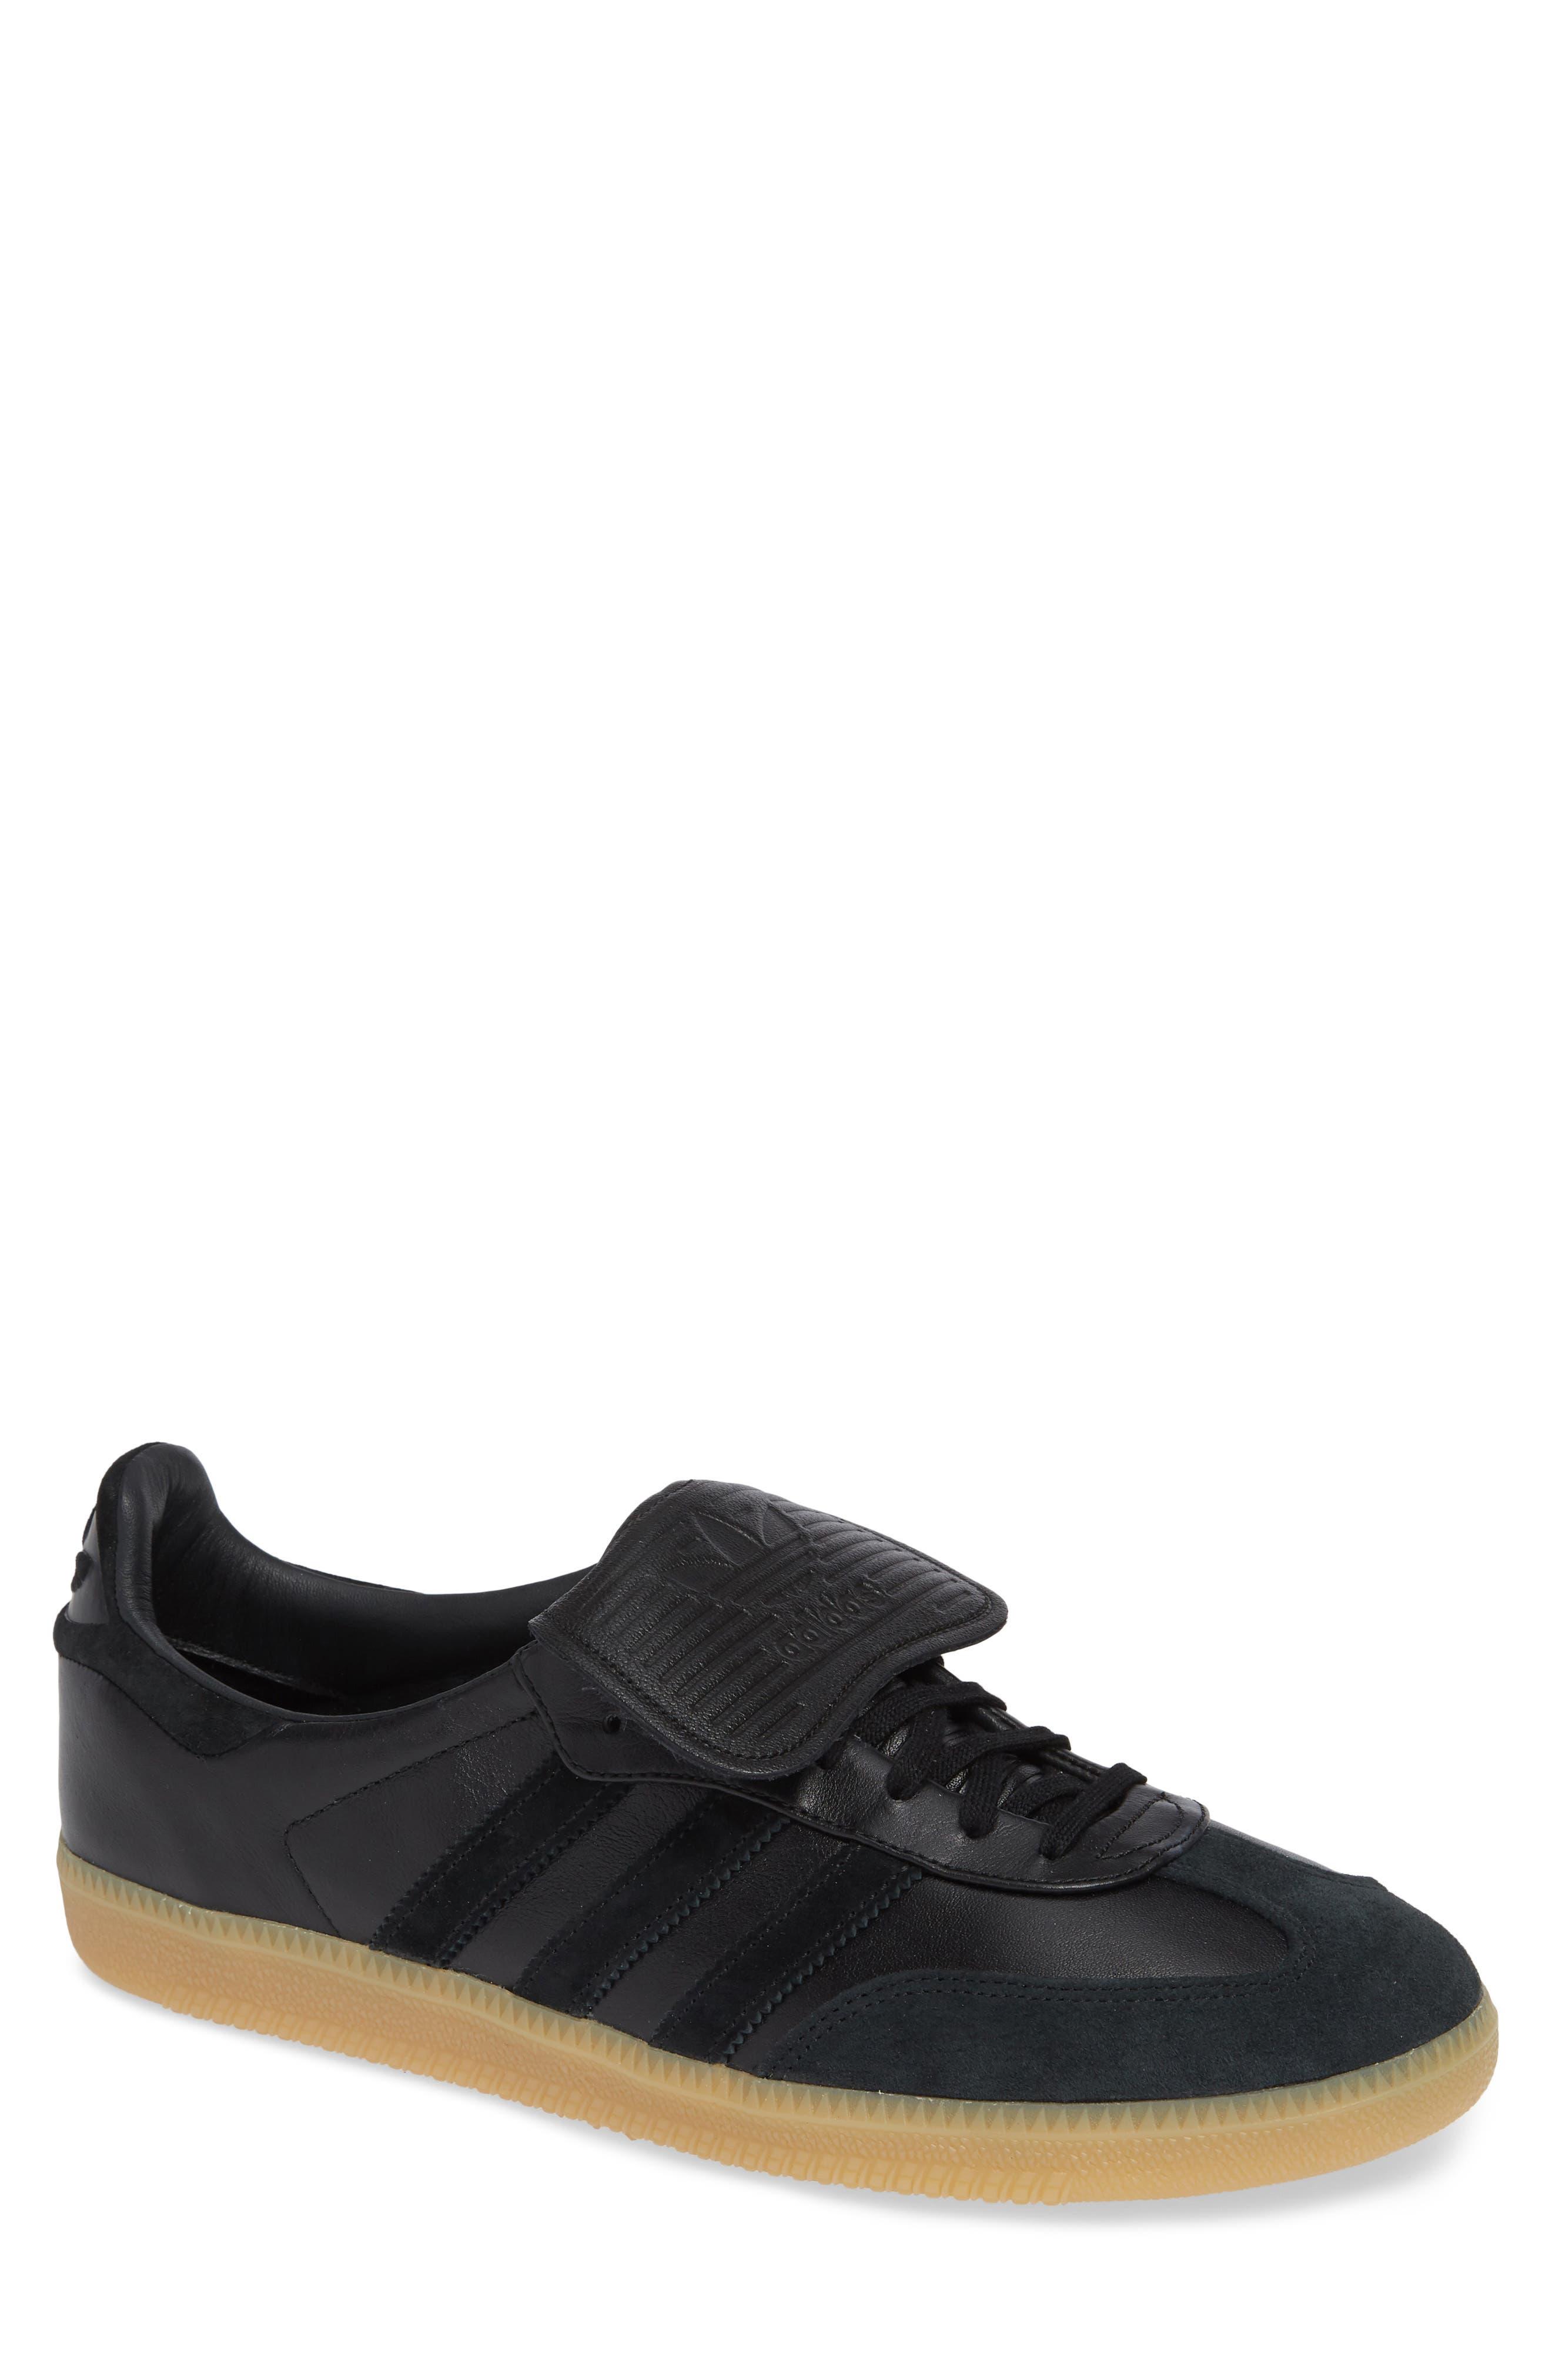 Adidas Samba Recon Lt Sneaker, Black